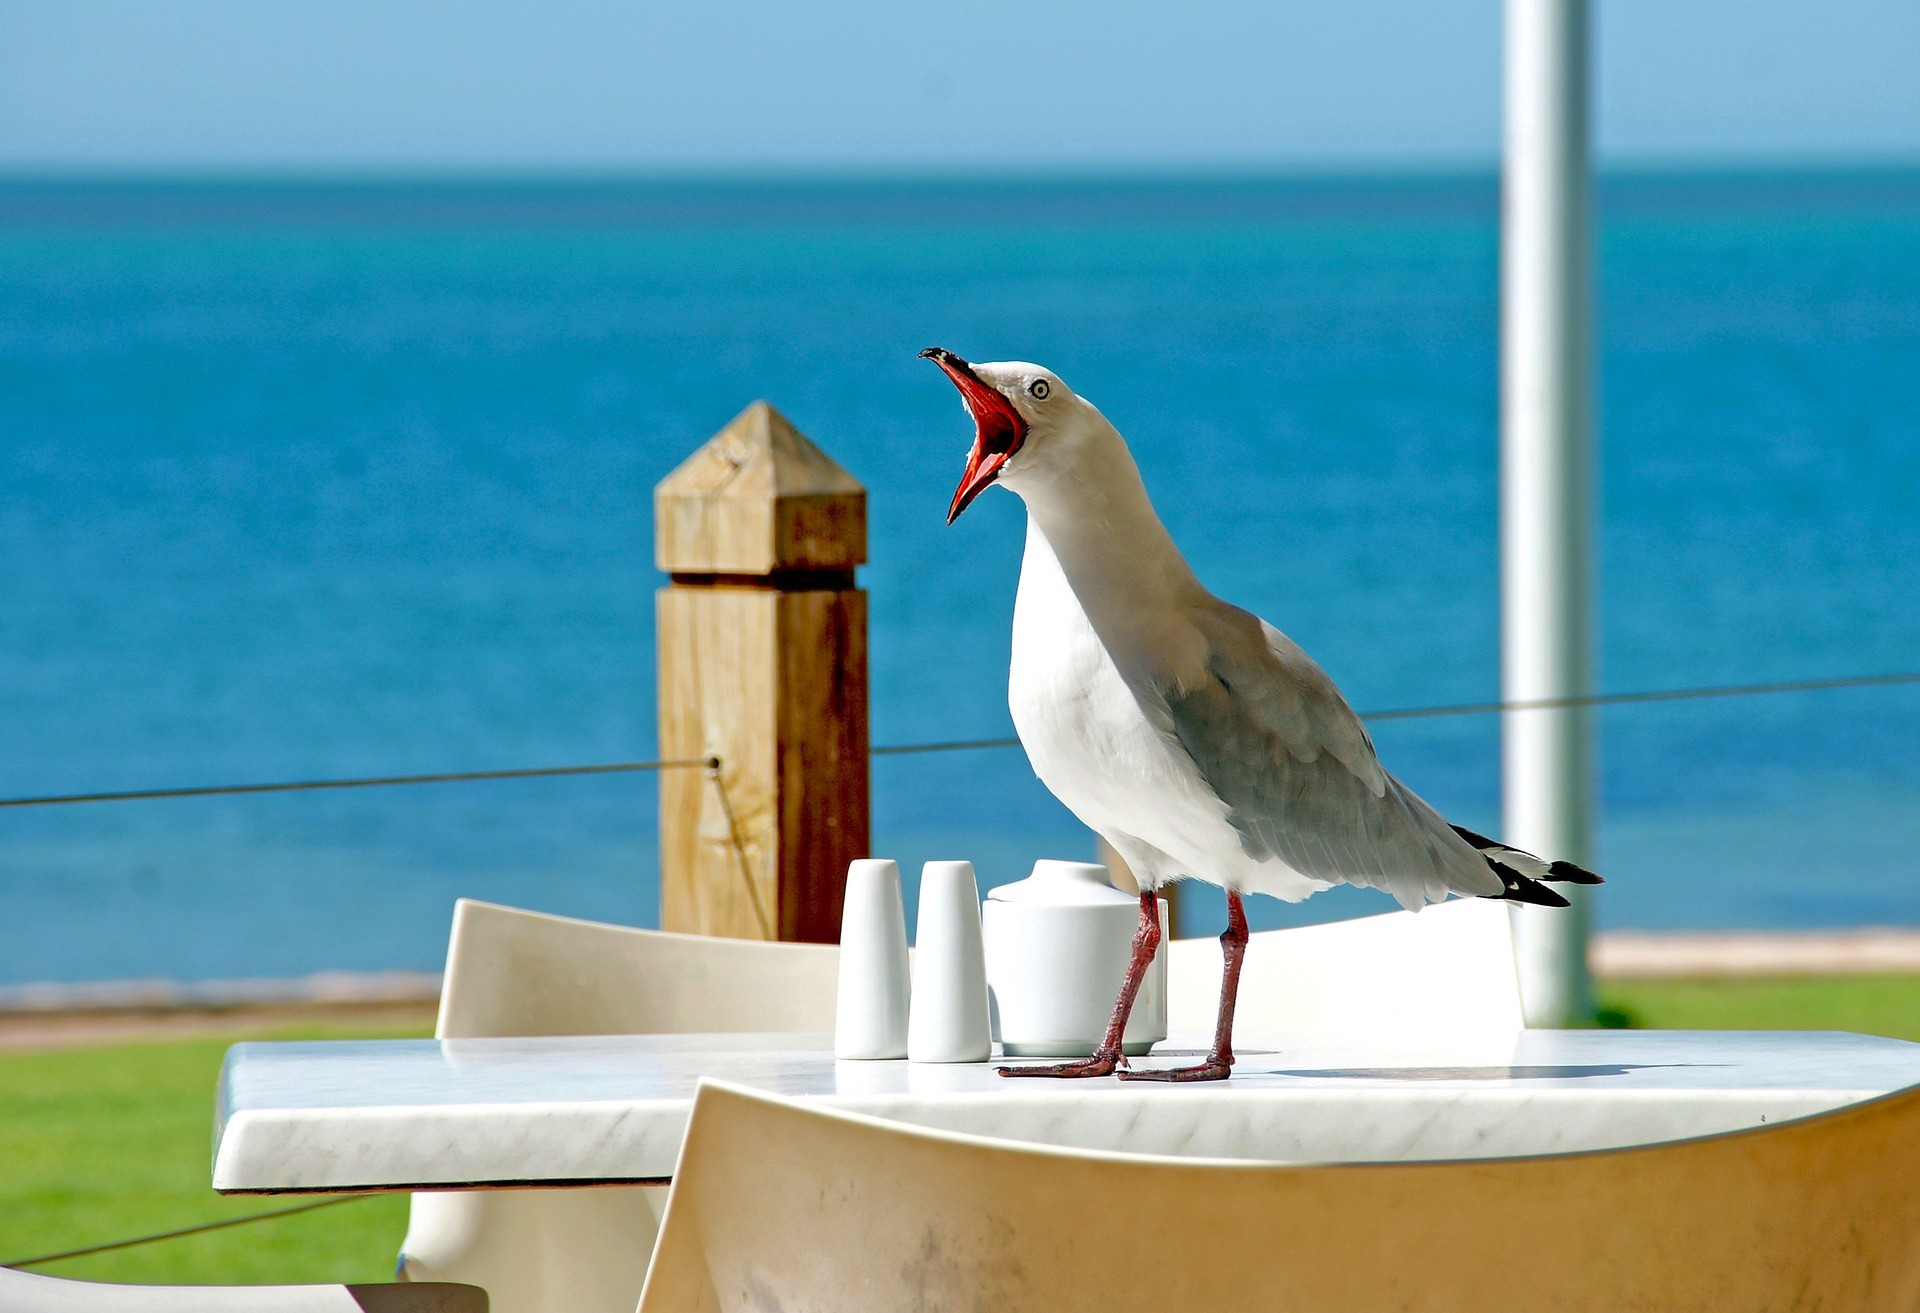 seagull-1159015_1920